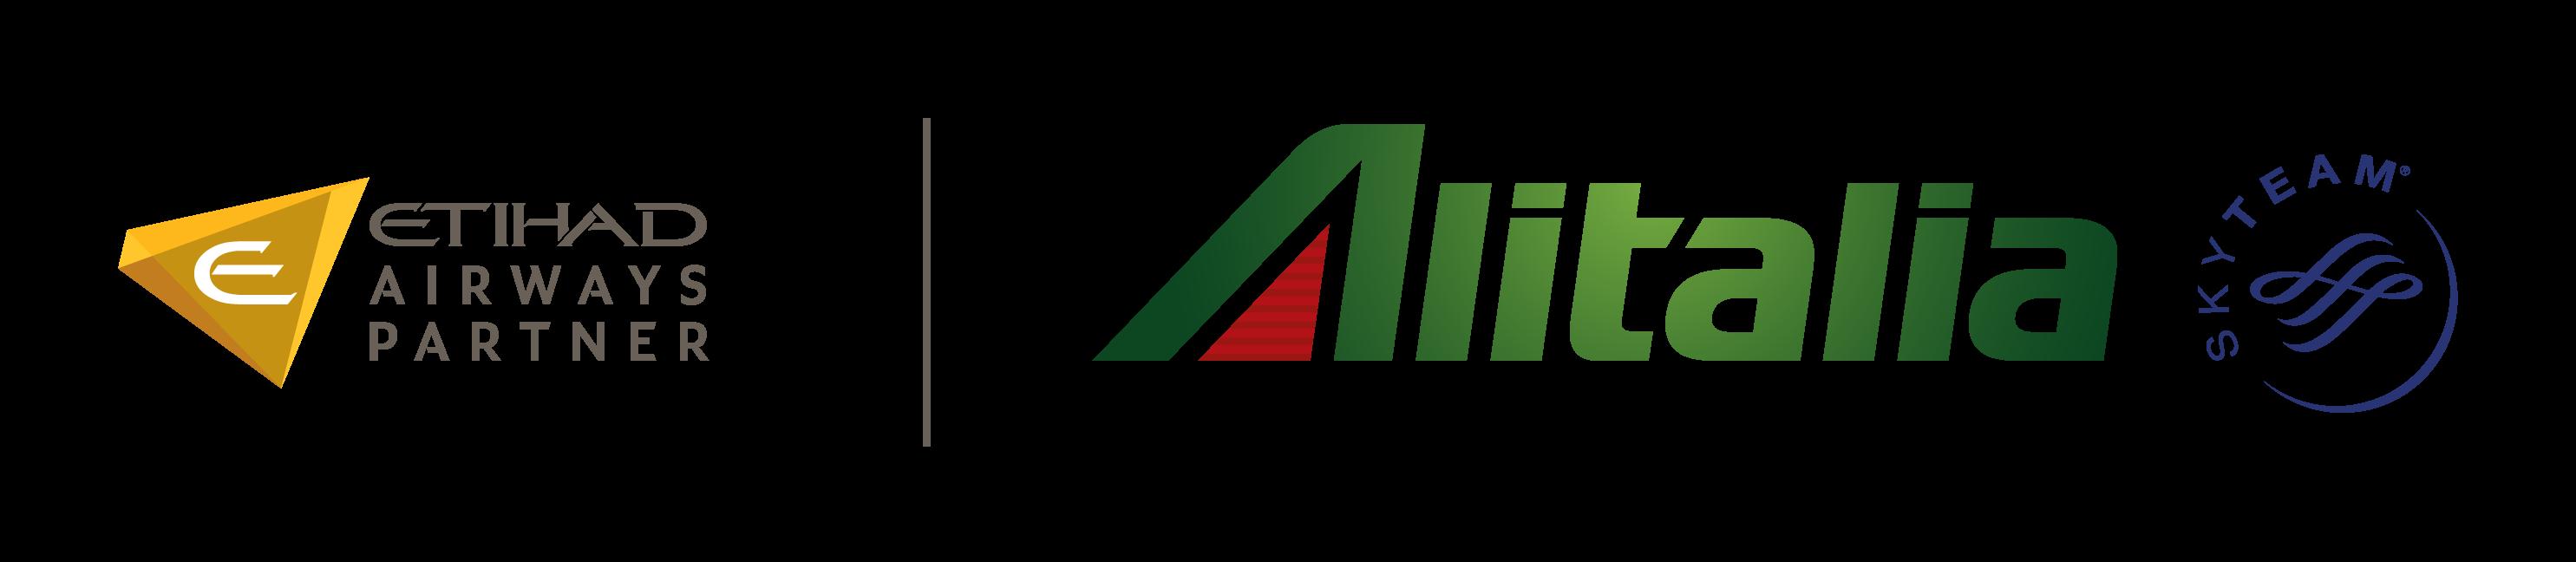 Alitalia Eti Sky Logo RGB